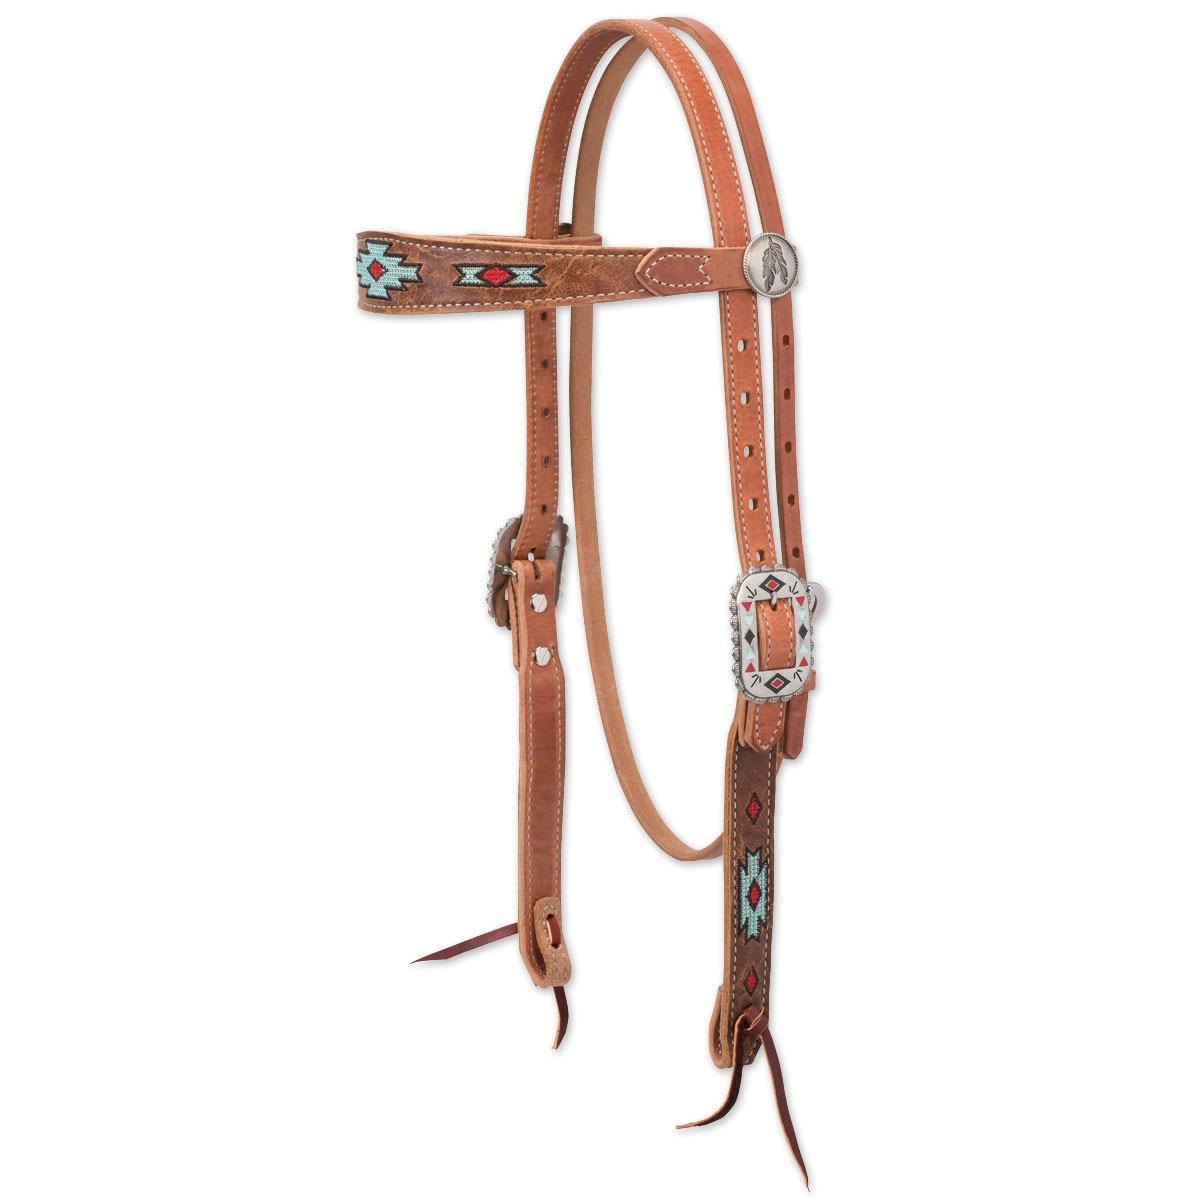 Weaver Native Spirit Browband Headstall